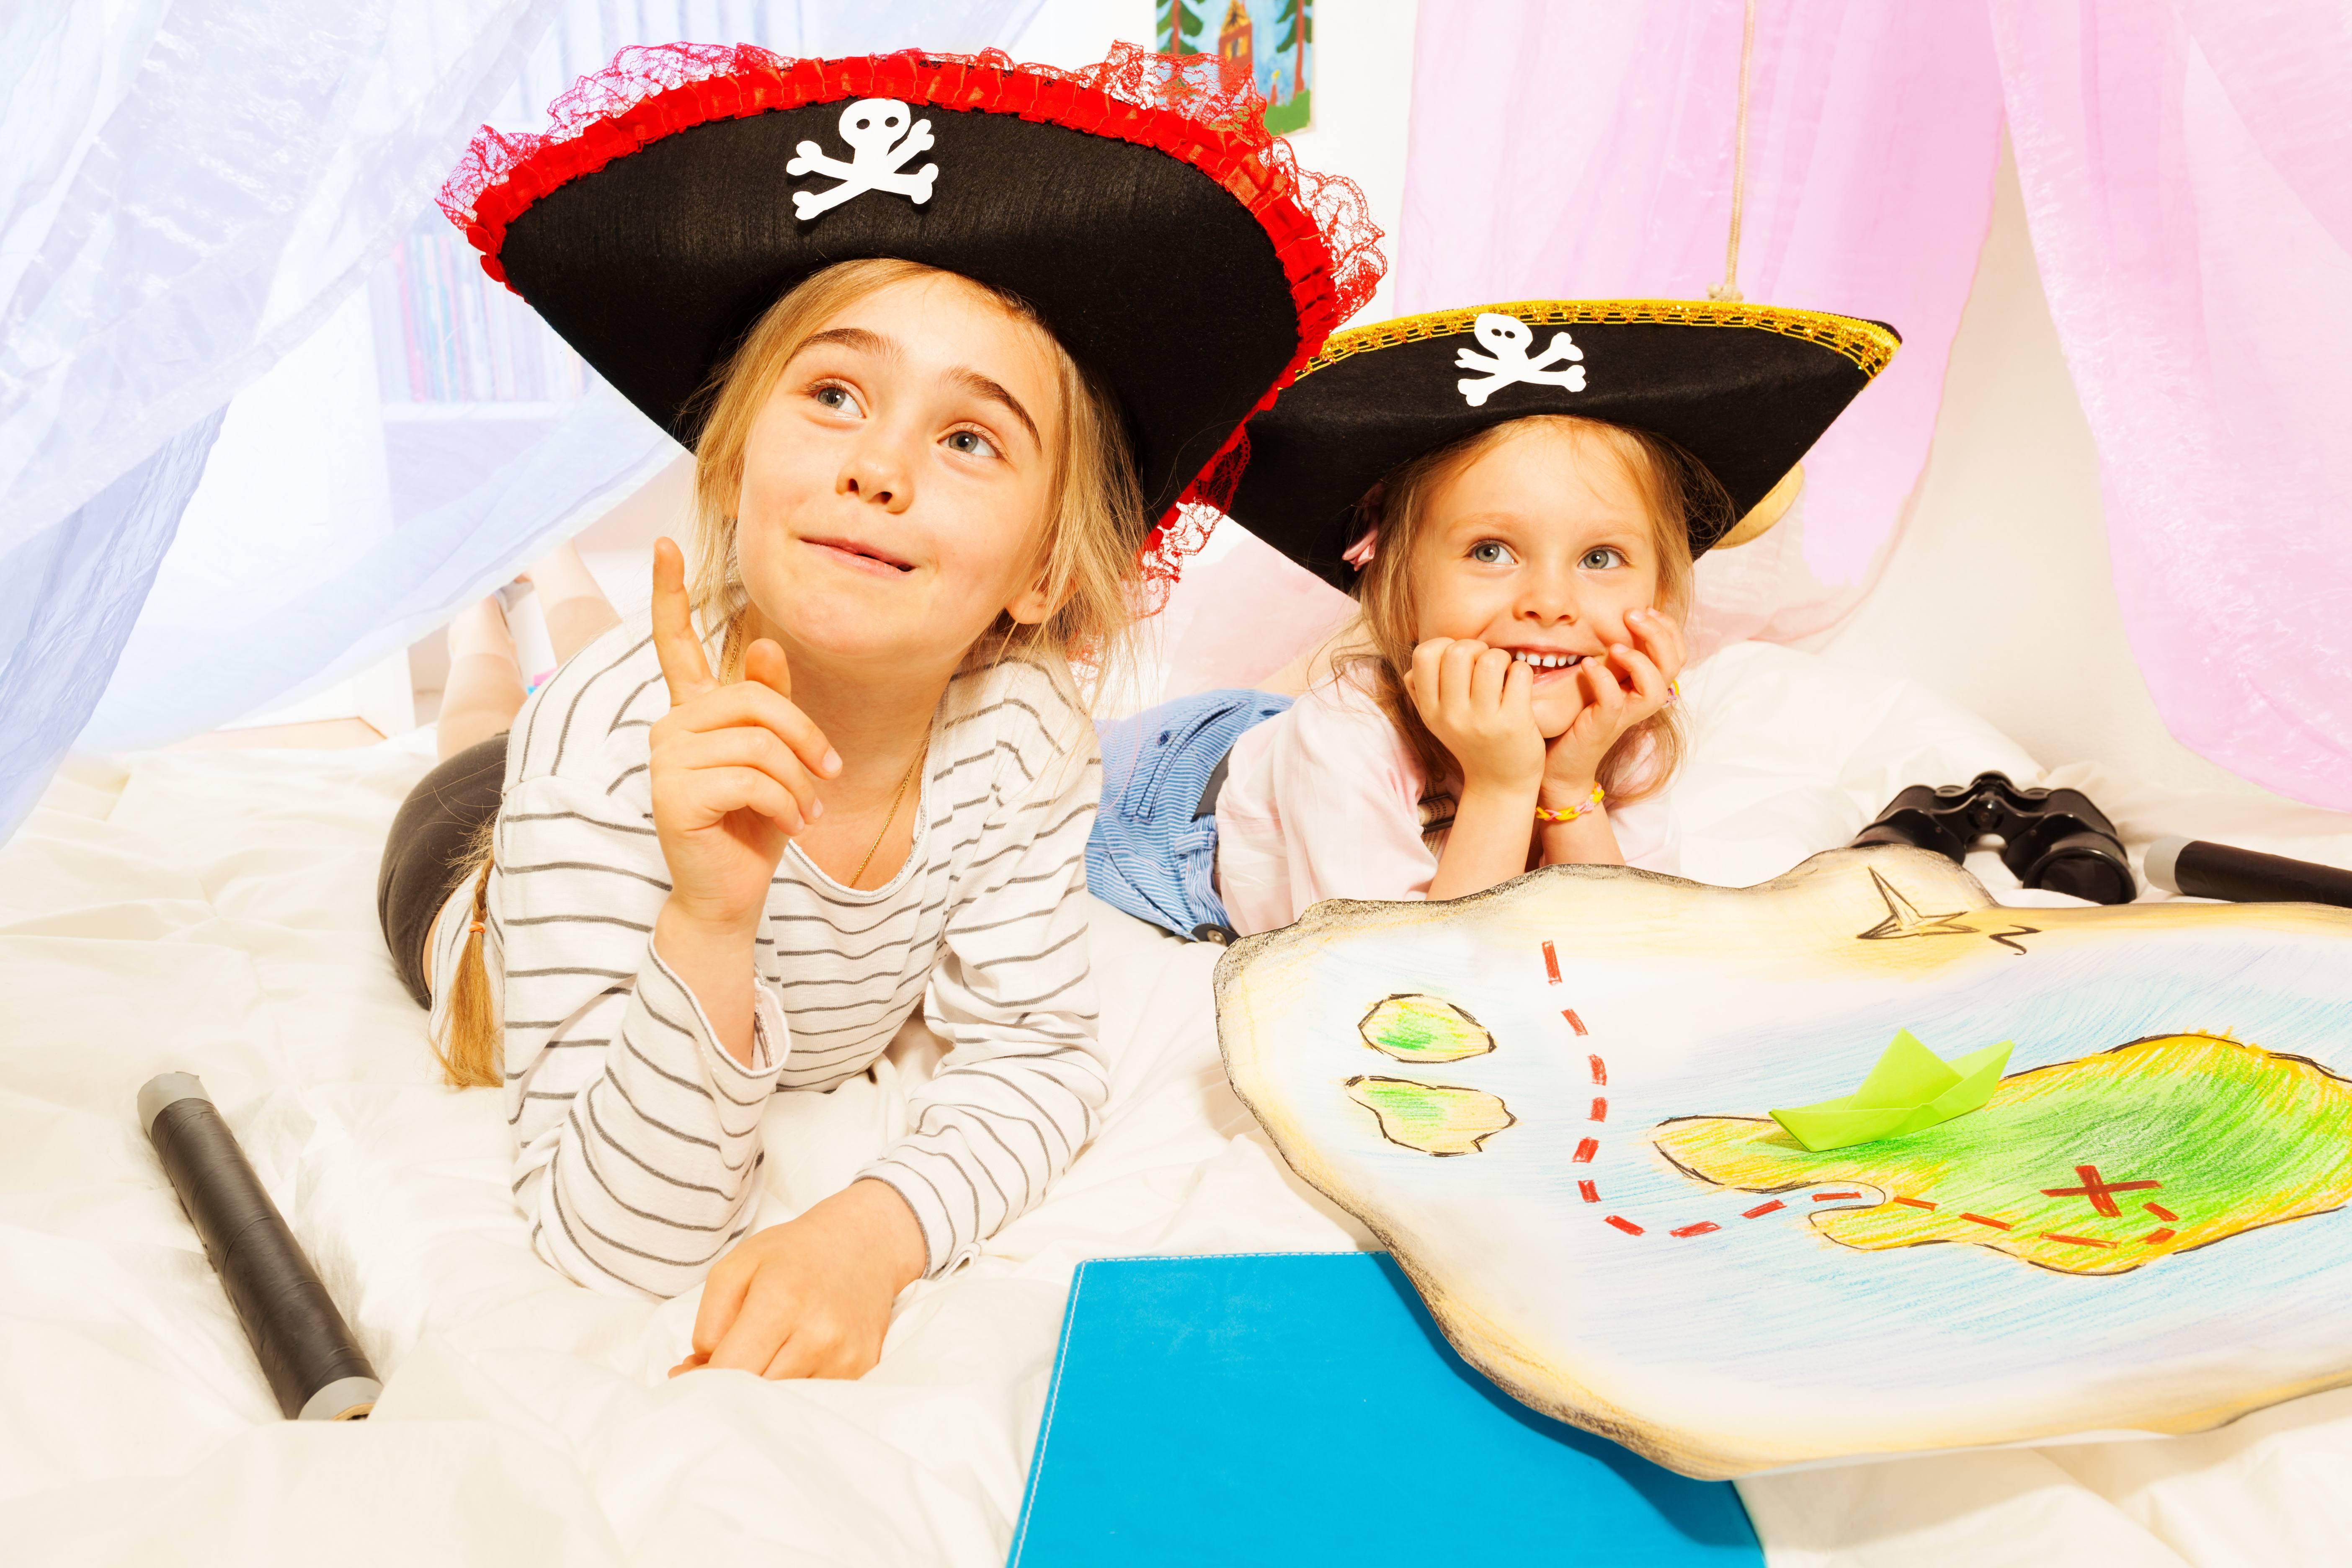 Wonderlijk Piratenfeest! - SPEURTOCHT KINDERFEESTJE YL-17